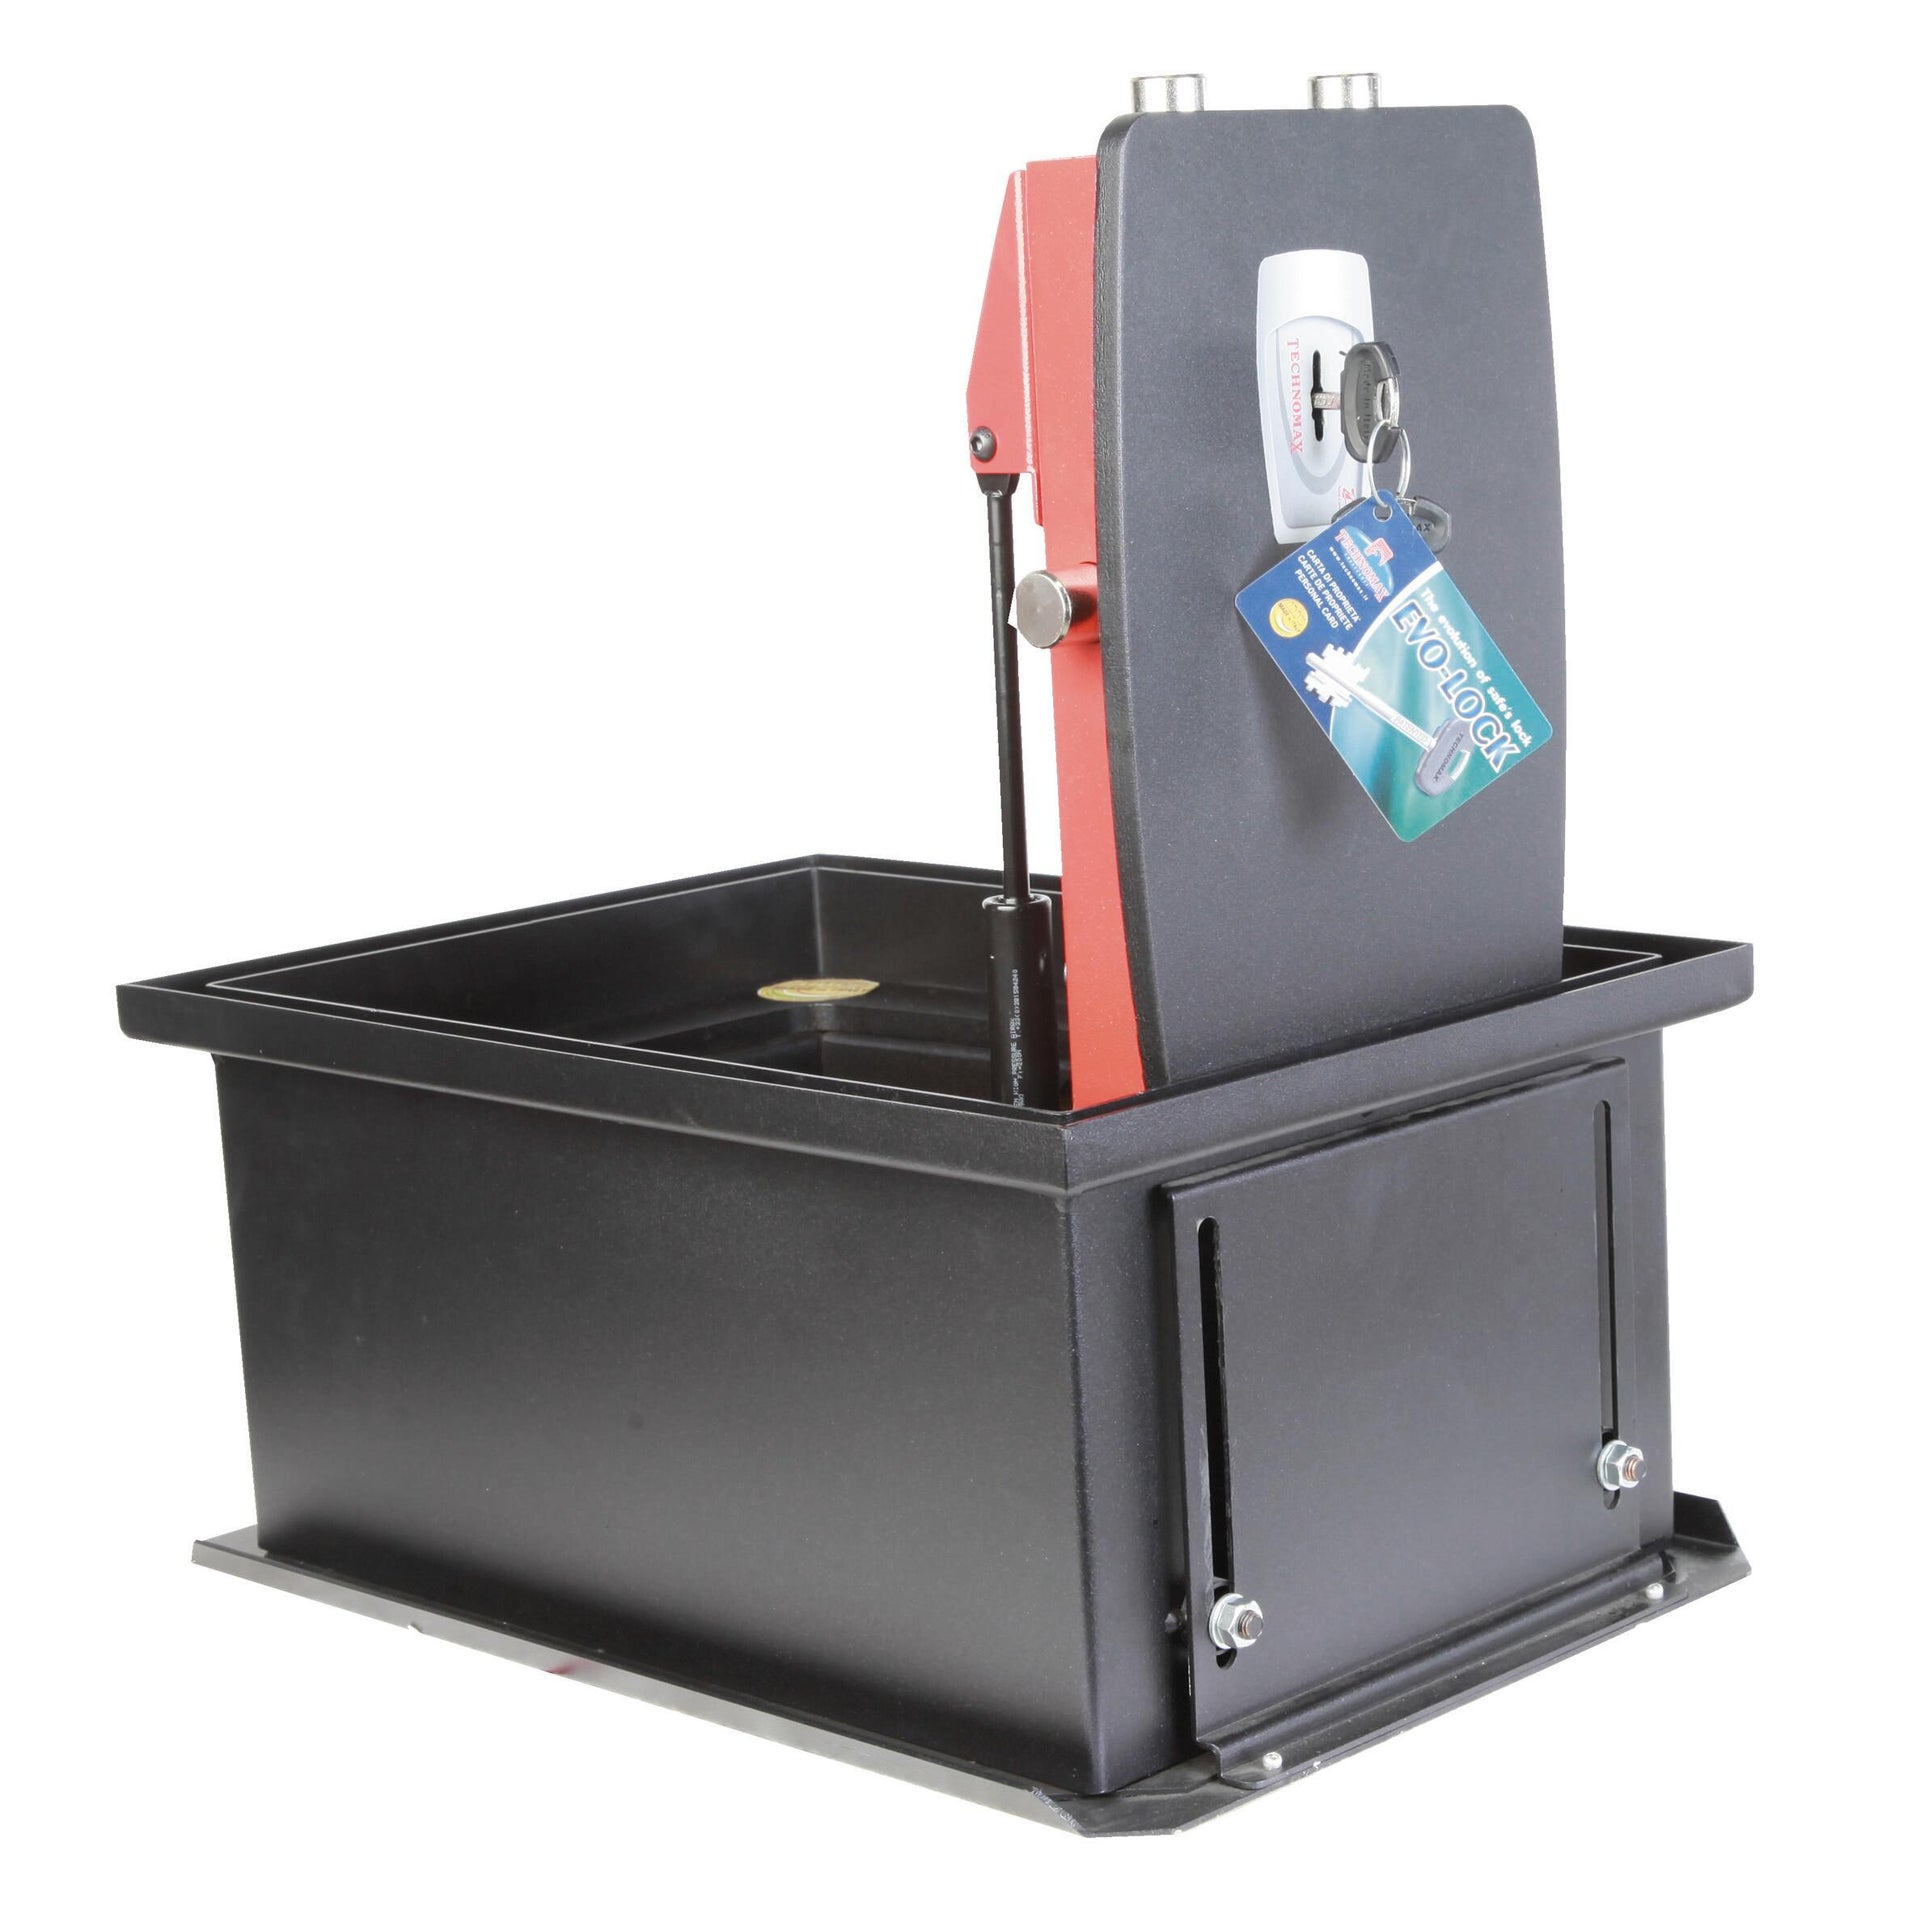 Cassaforte a chiave TECHNOMAX NF/4K da incassare a pavimento L44 x P32 x H21 cm - 3